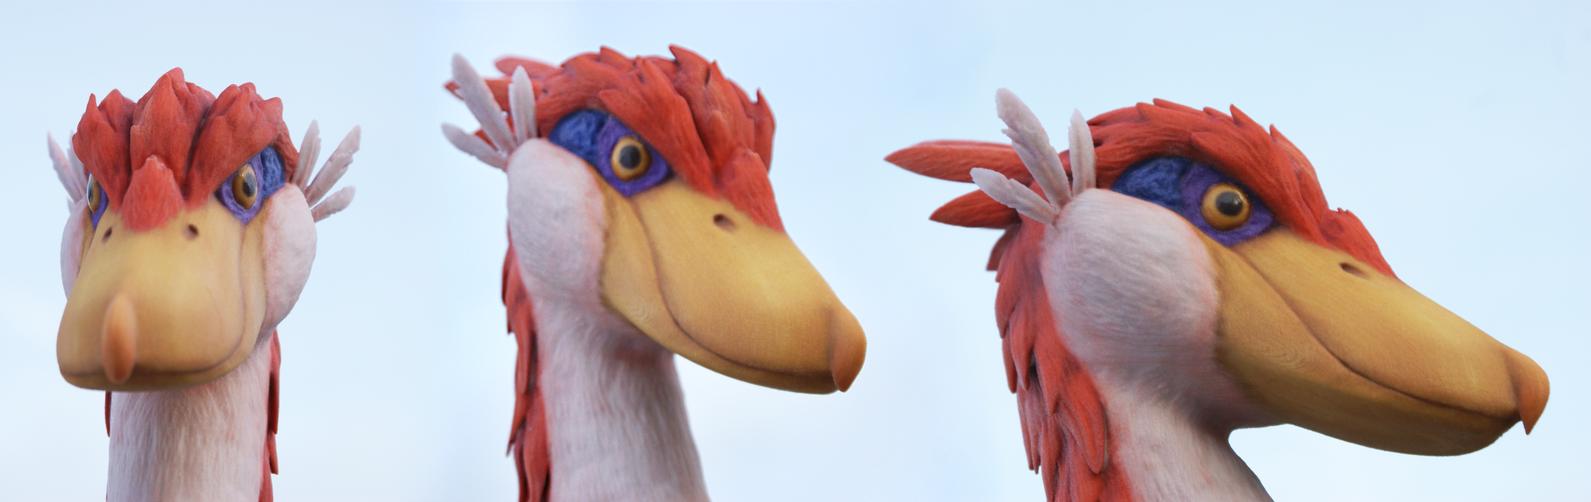 I <3 shoebills [Archive] - The Return of Talking Time